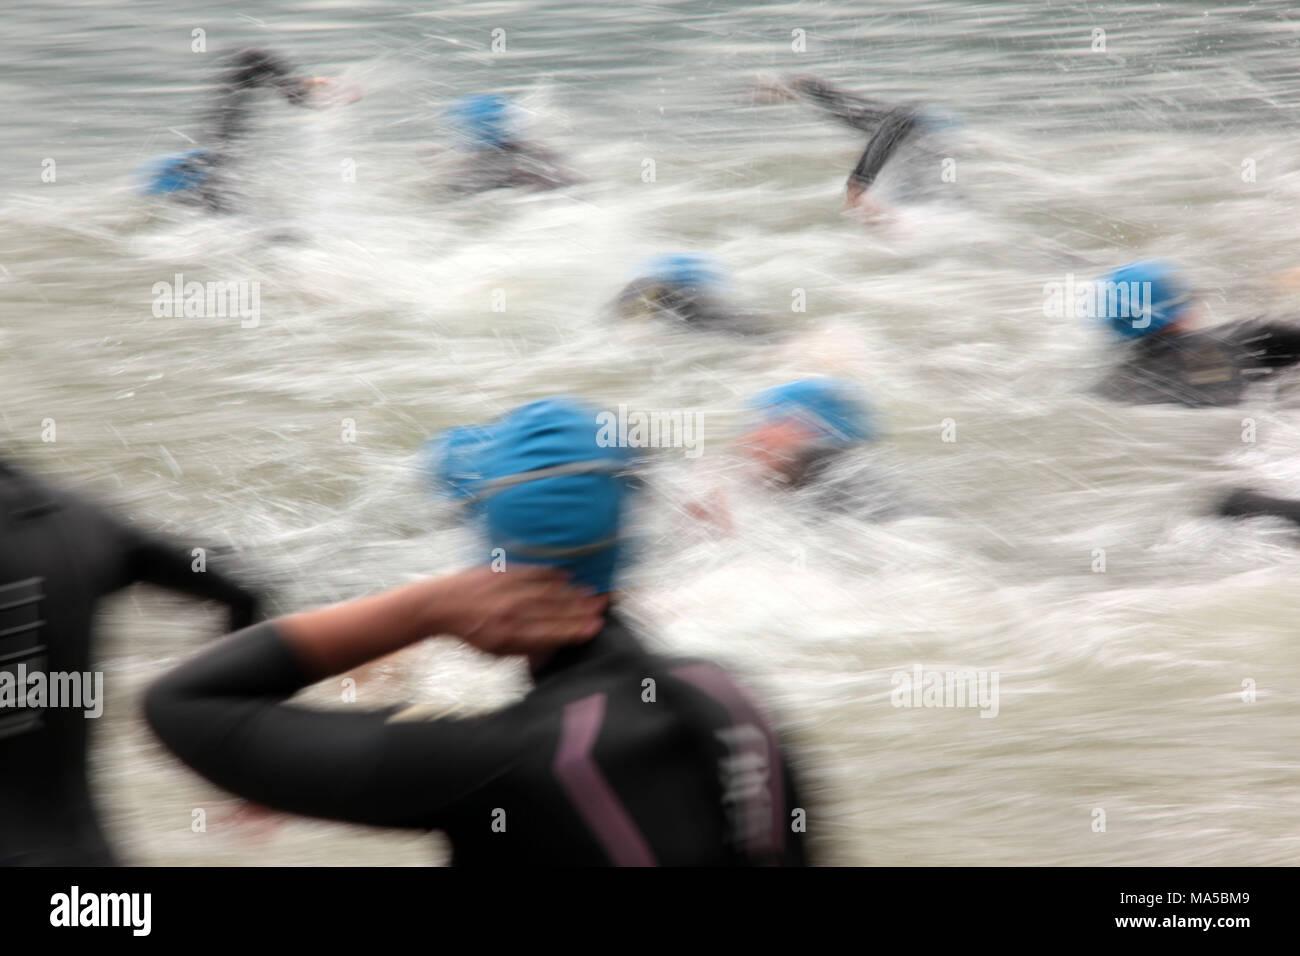 Garmin stock photos garmin stock images alamy garmin alps triathlon in schliersee athletes in the water blur stock image buycottarizona Gallery